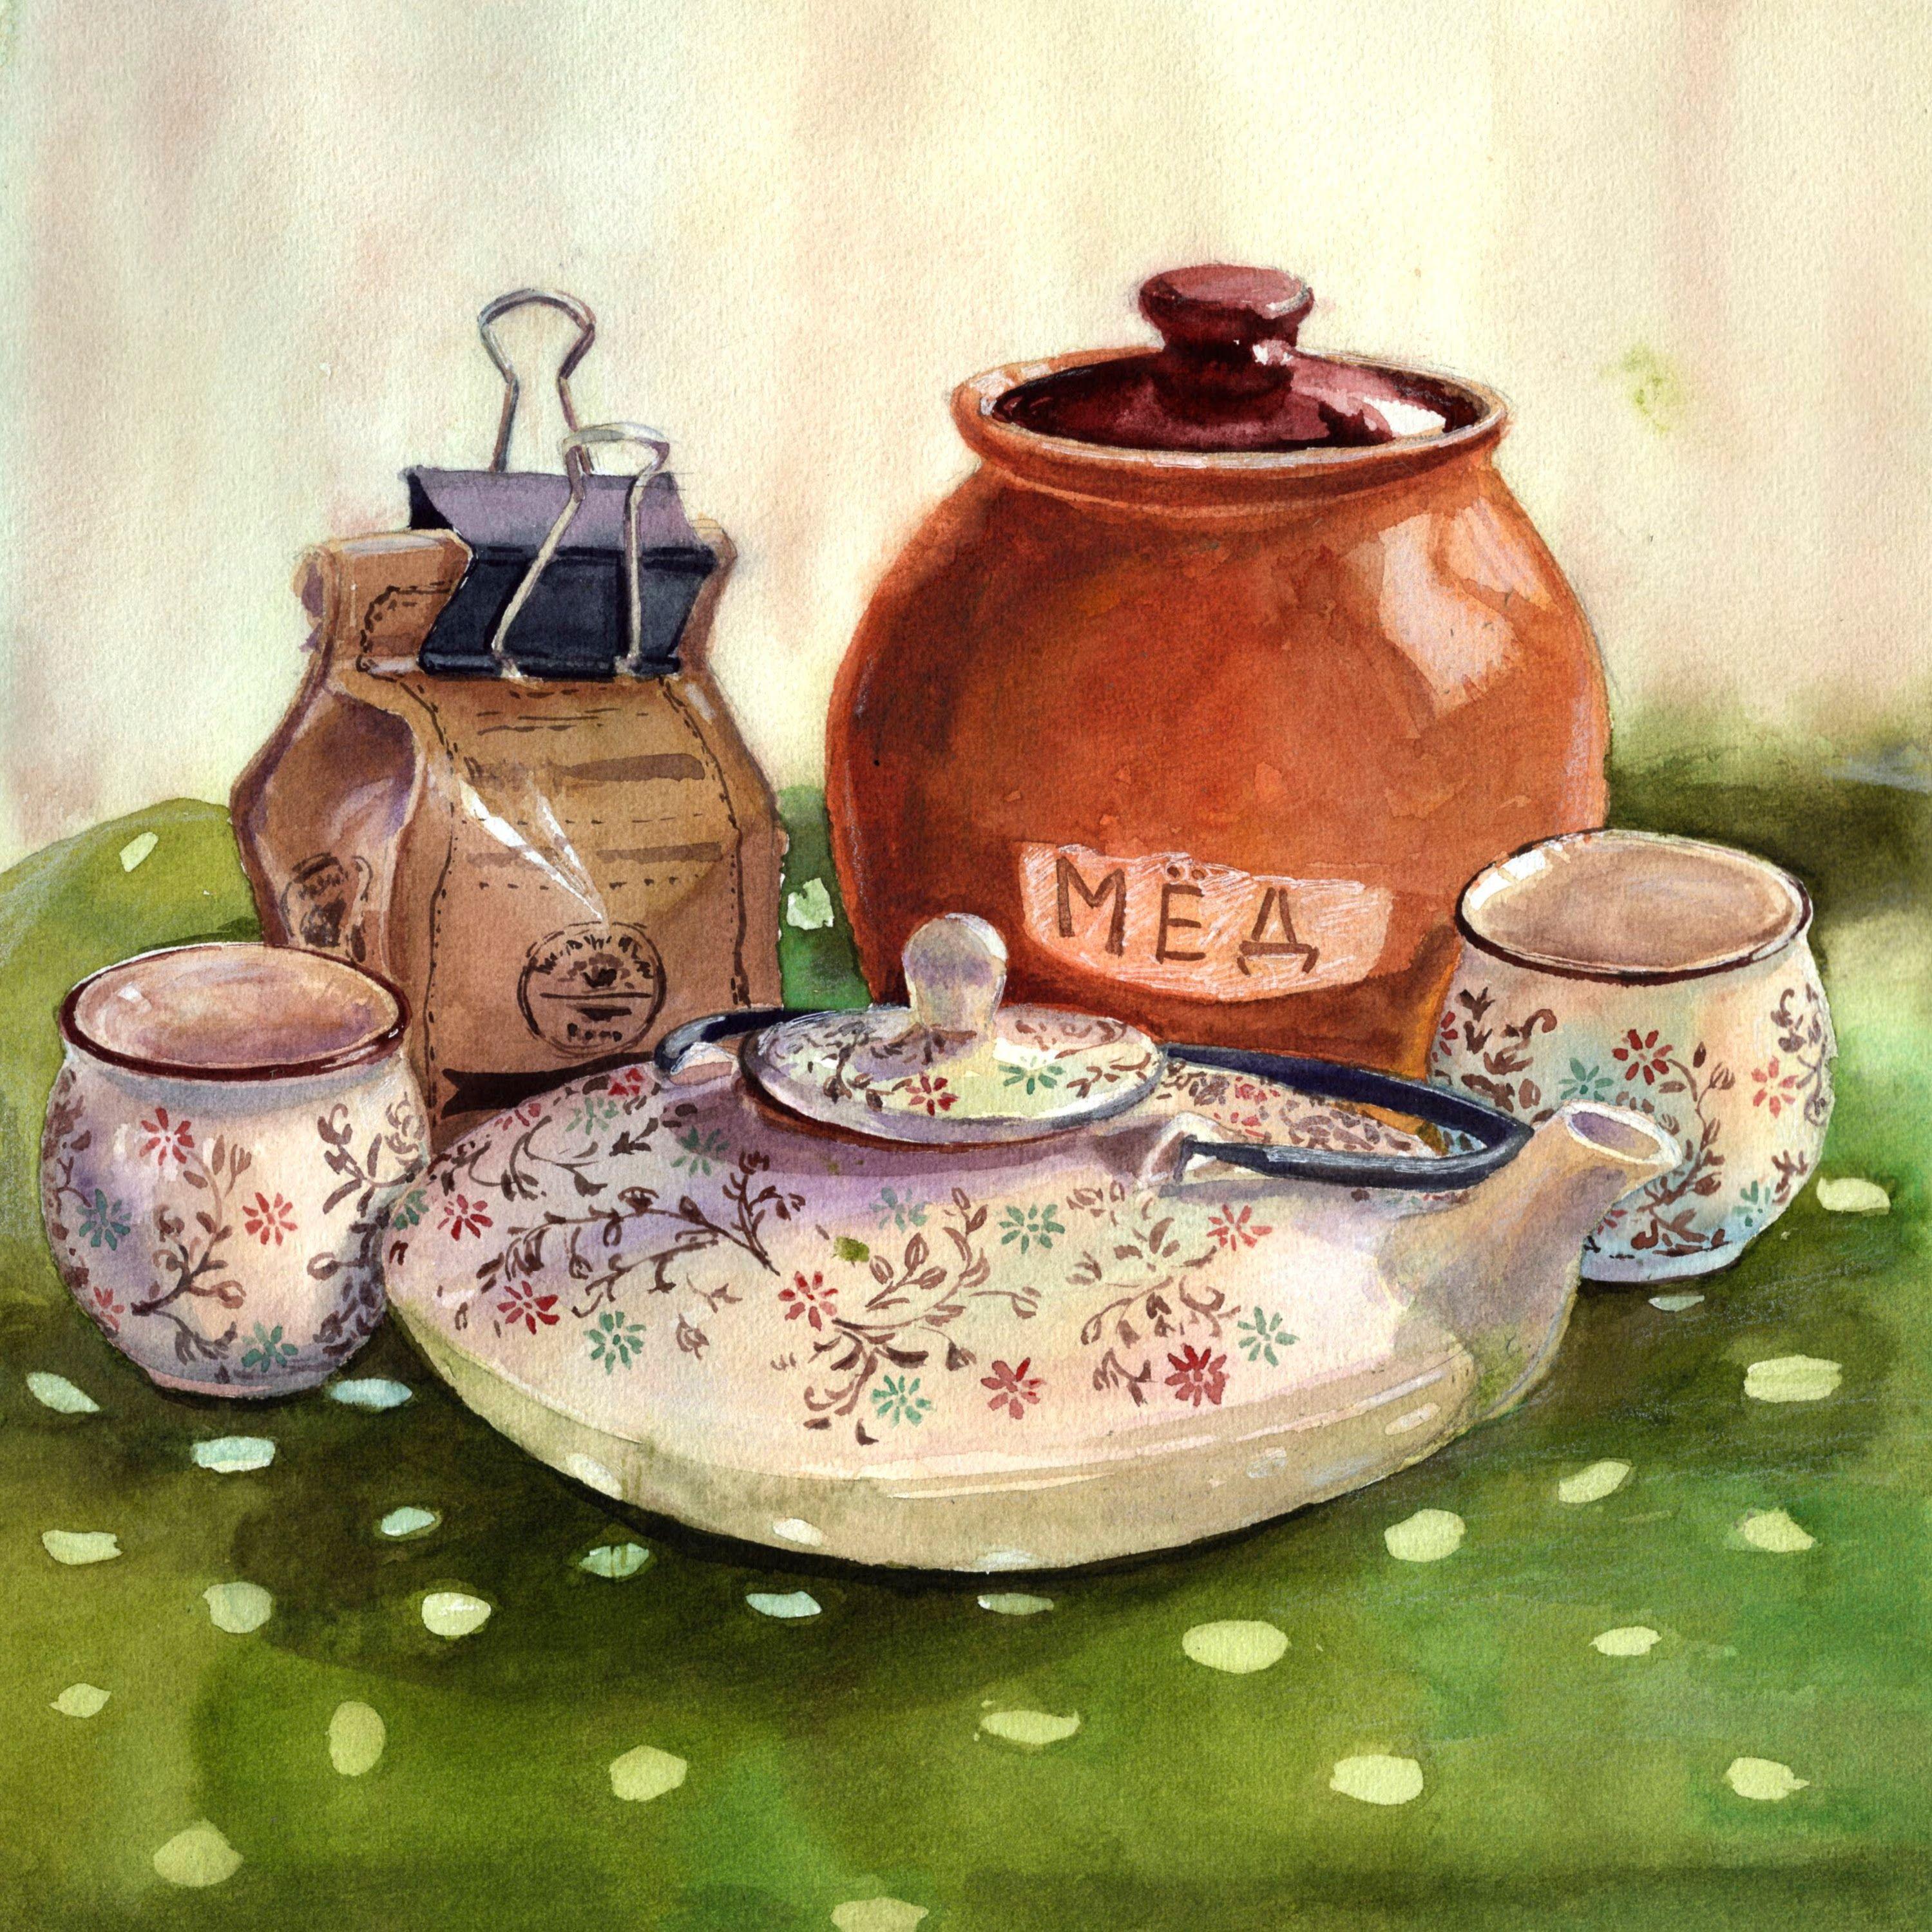 Галерея спасибо, веселые картинки с чаепитием